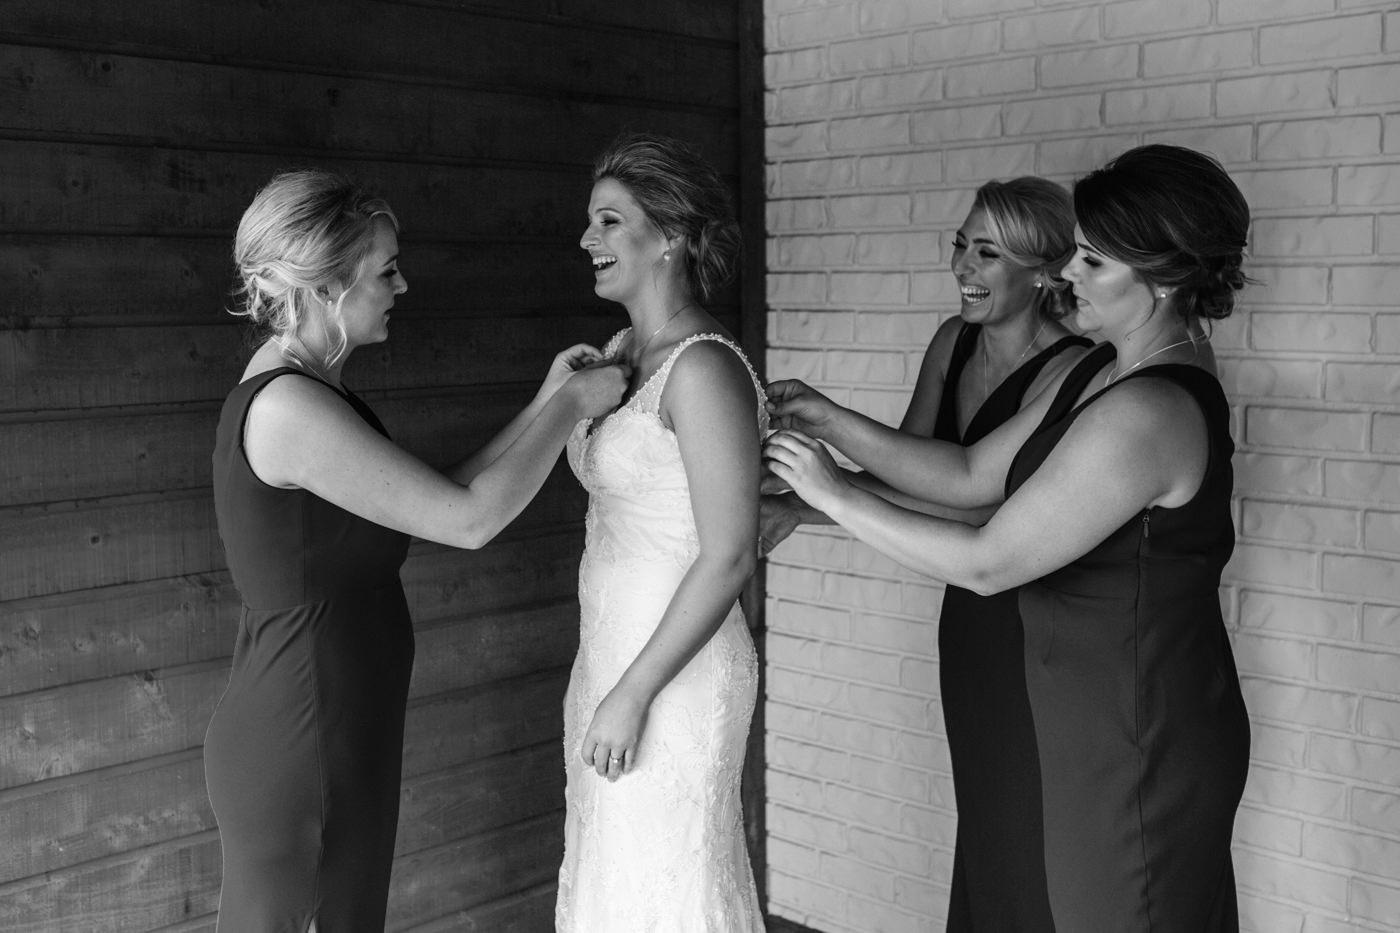 bracu_wedding_photos1025.jpg